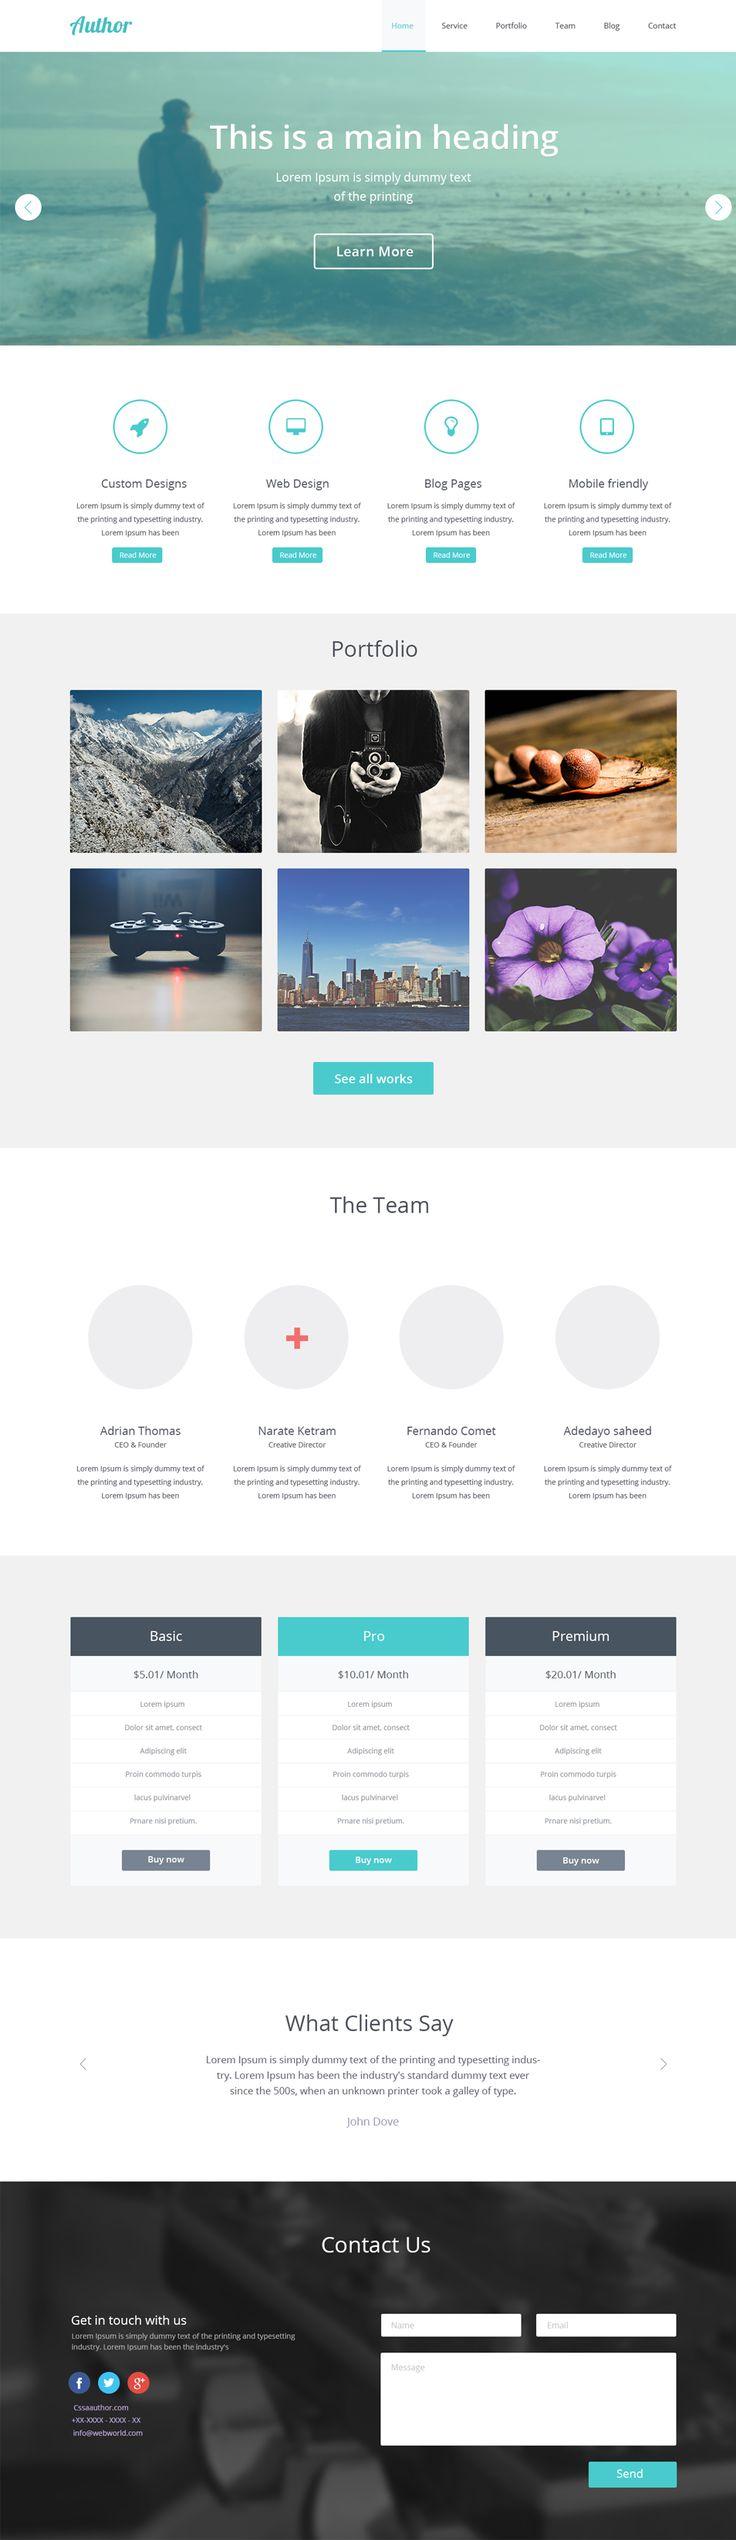 Free Agency Web Template PSD – Freebie No:129